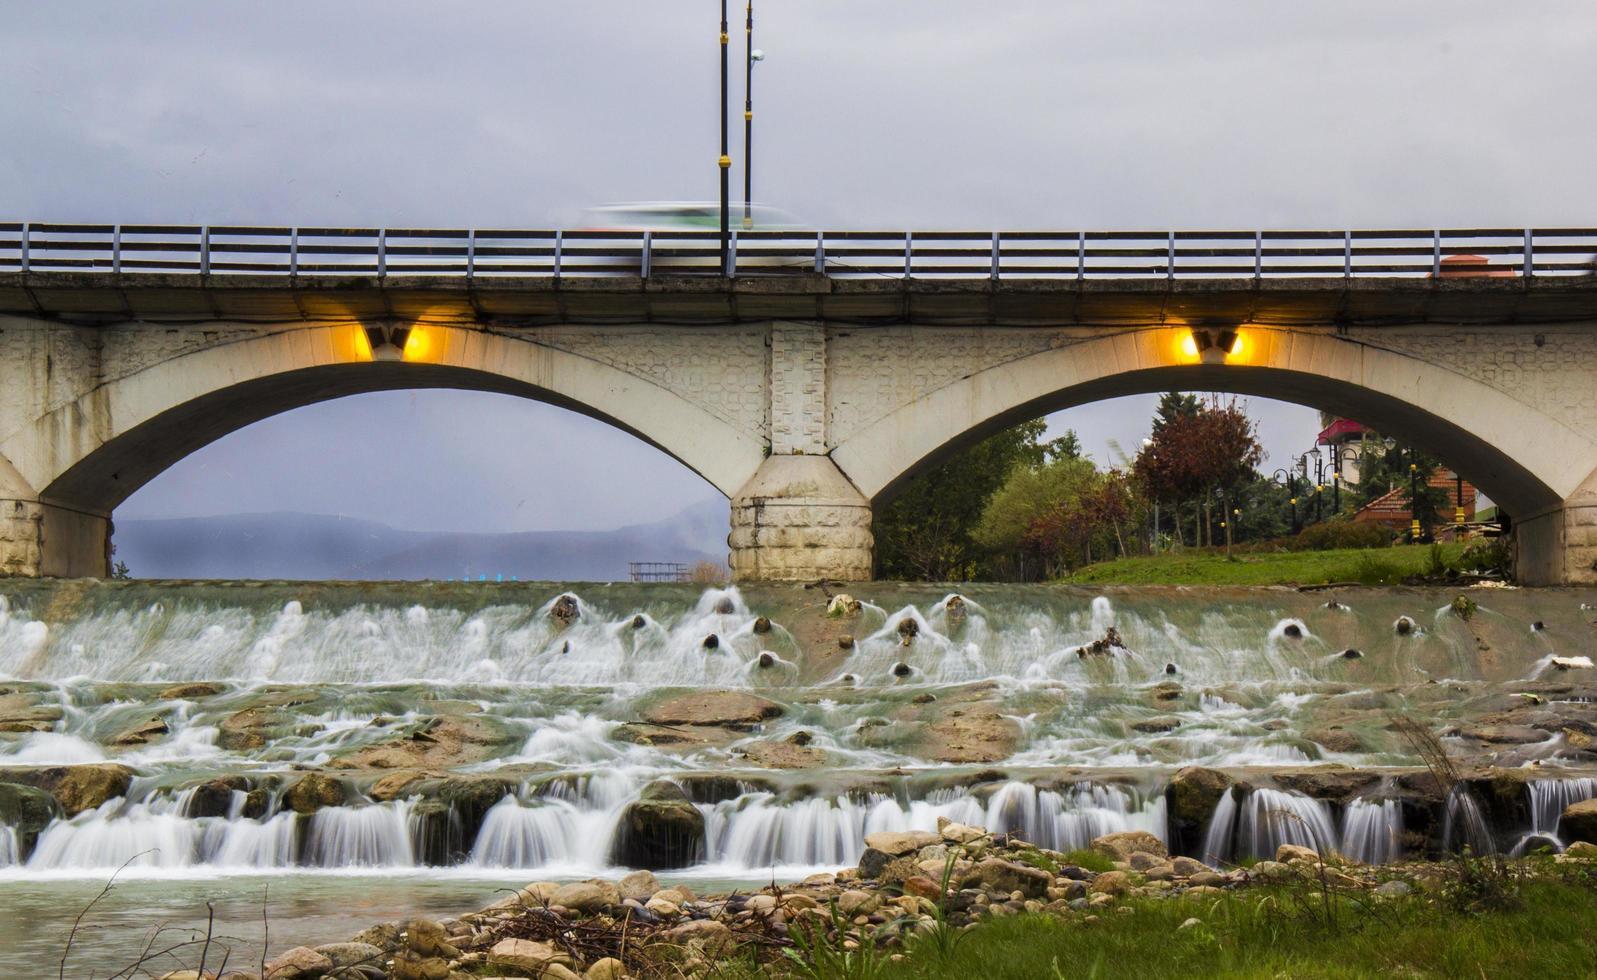 The Cheshmeh Bridge in Tonekabon City photo